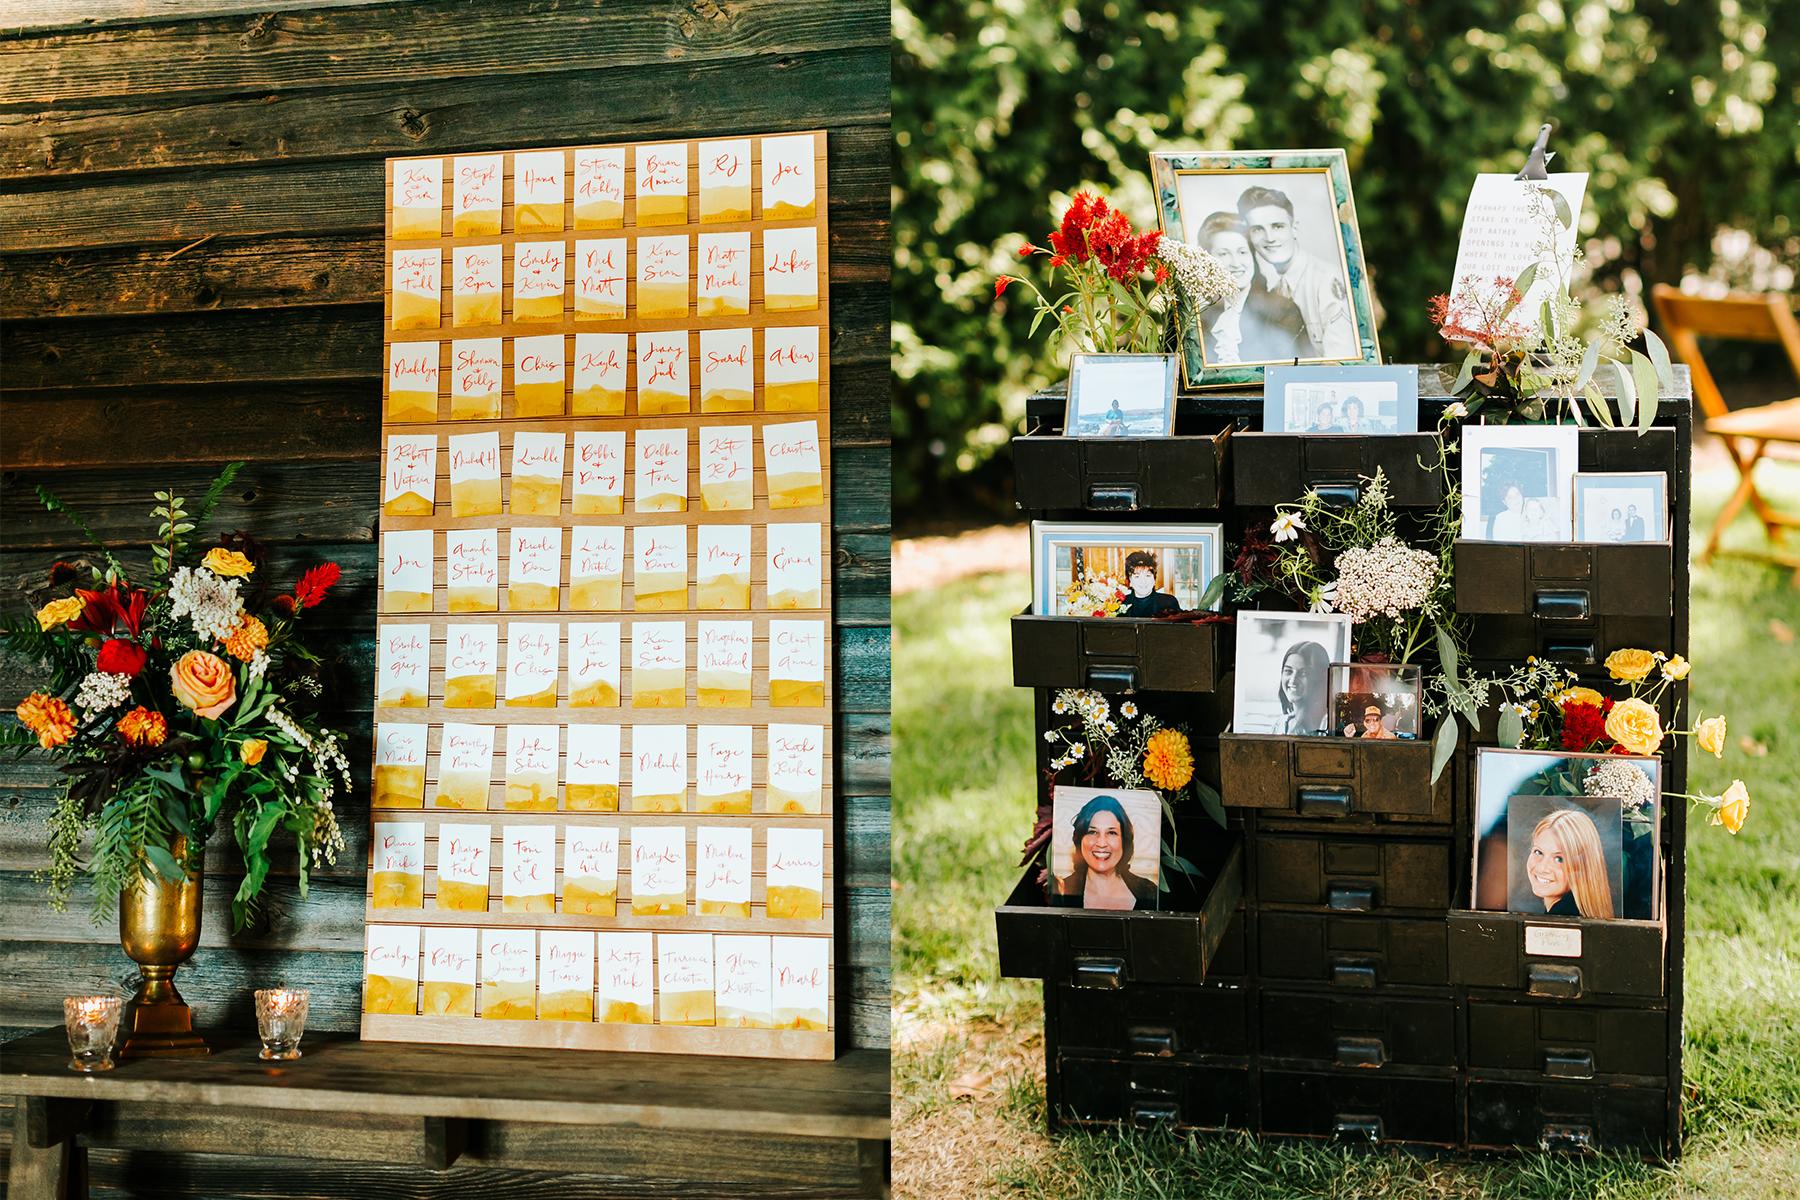 terrain+at+styers+gay+wedding+florist+colly+flowers5.jpg